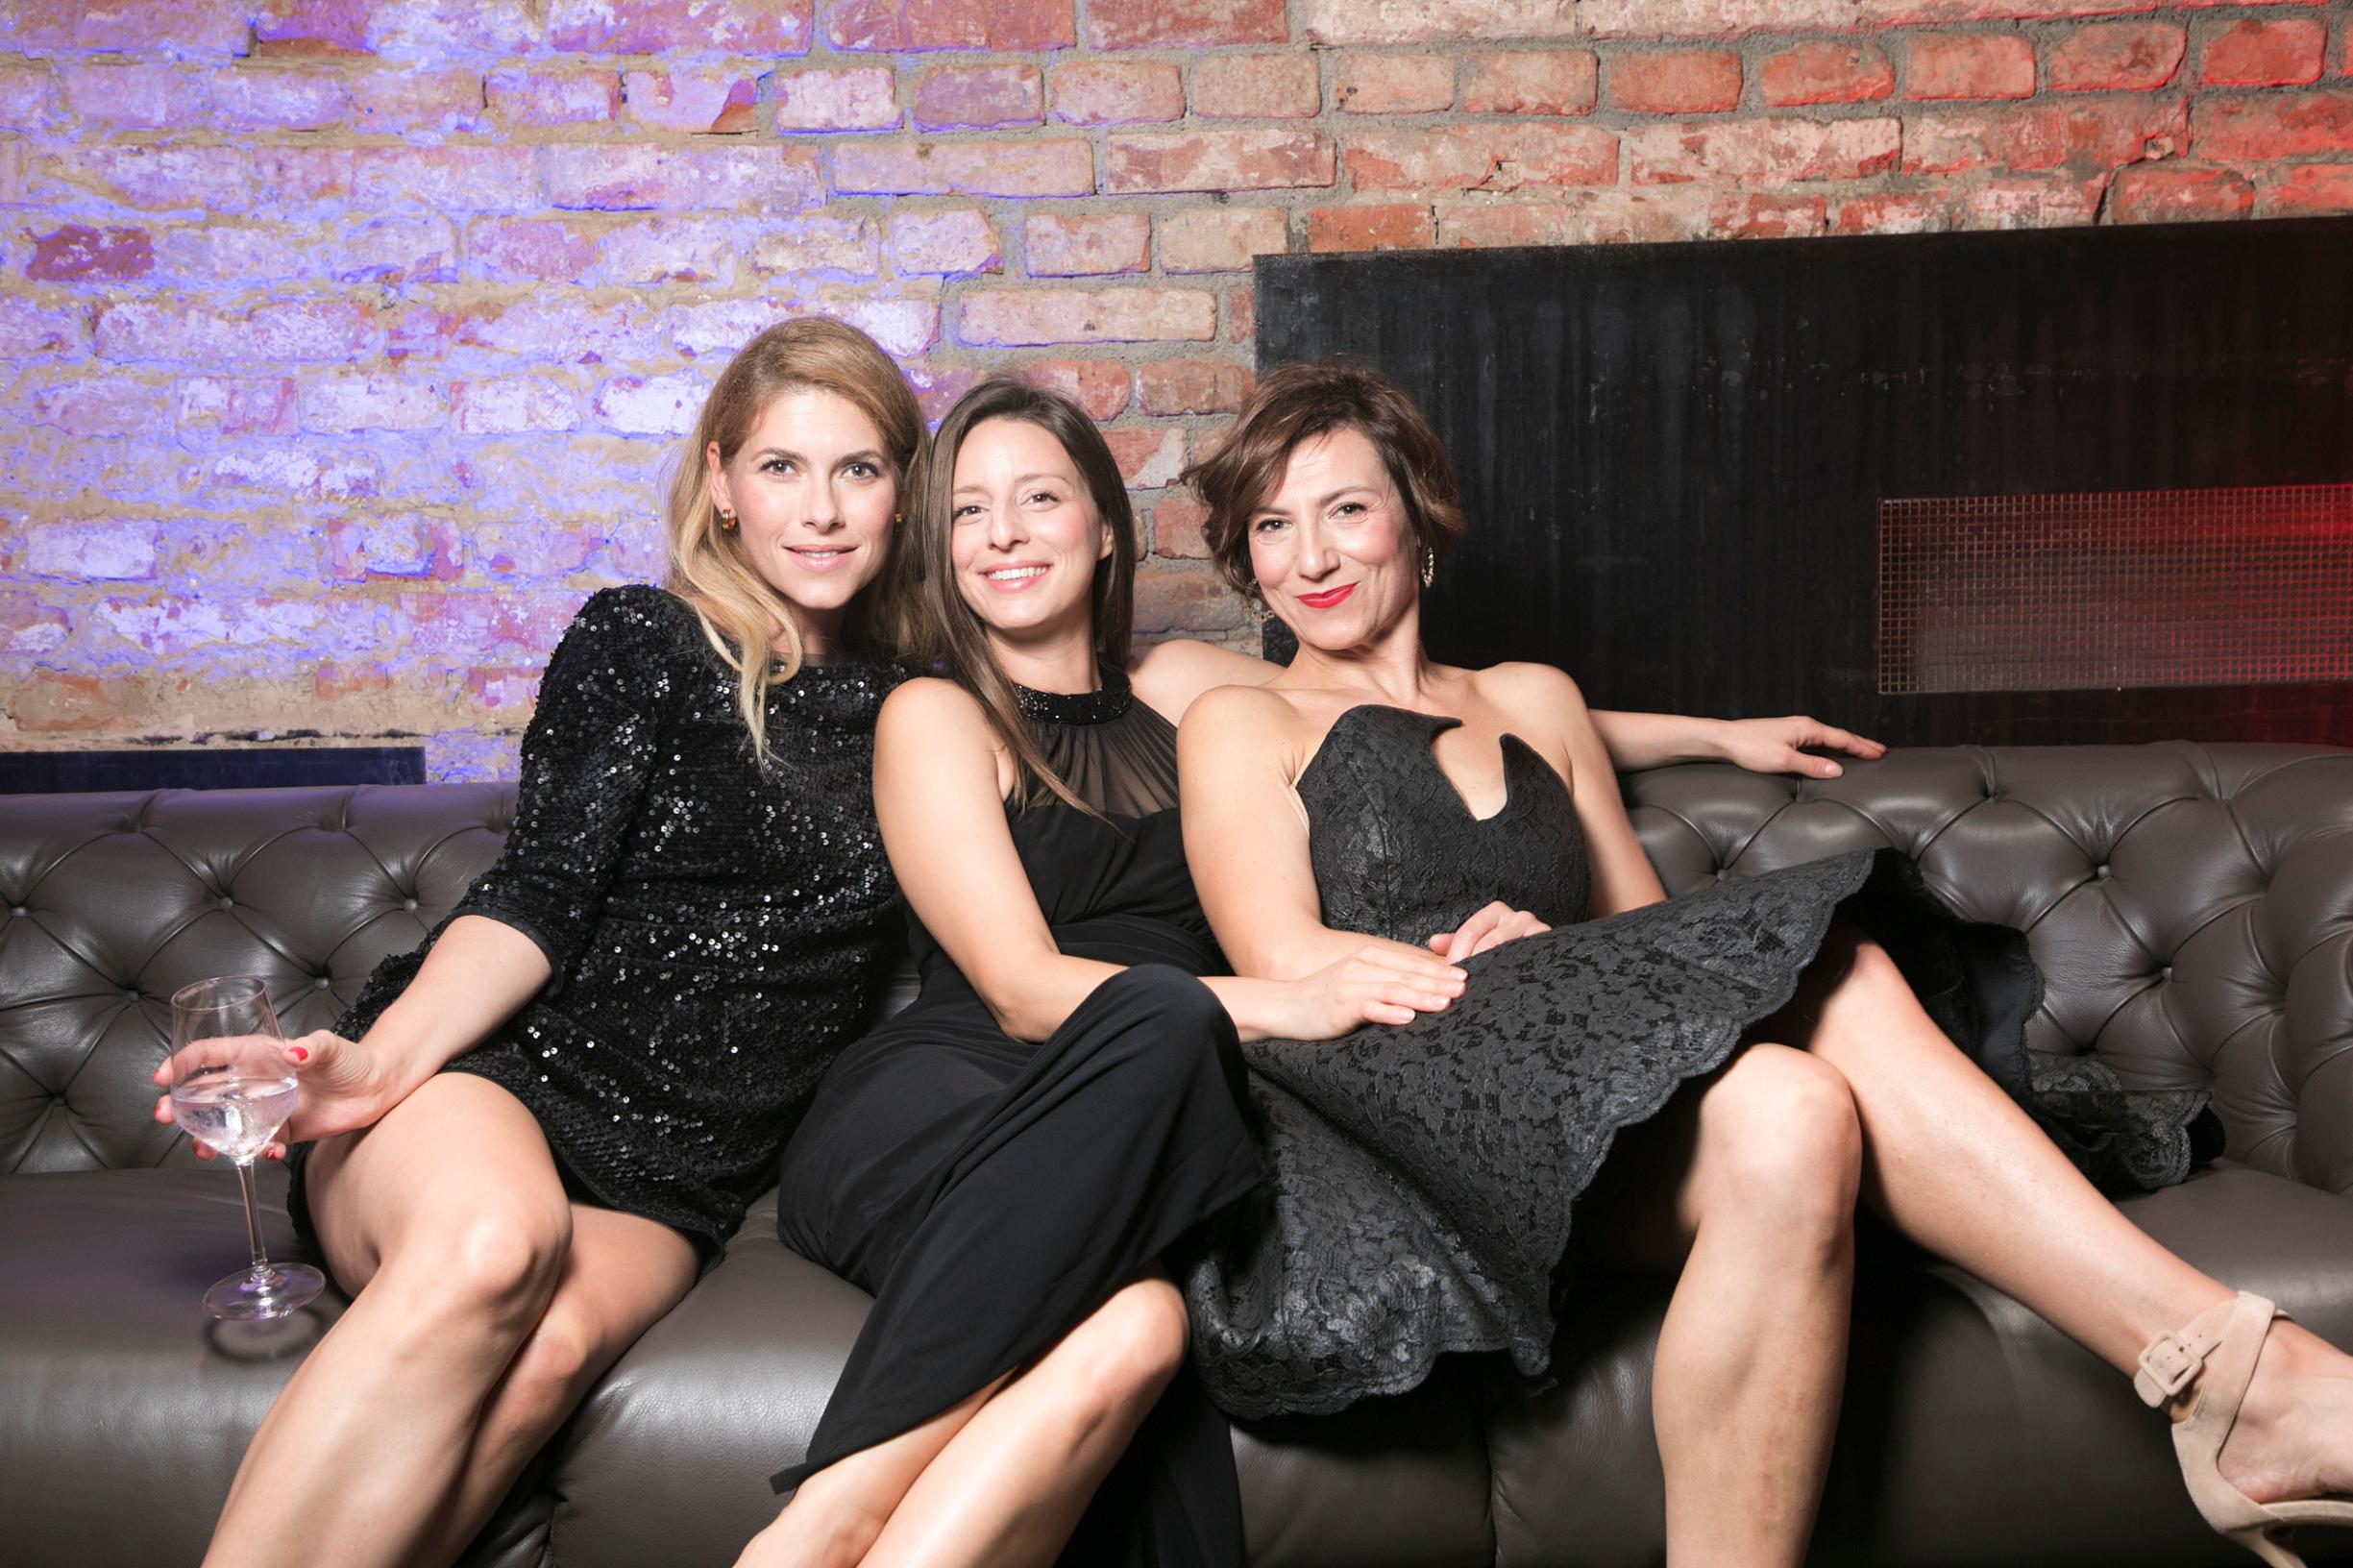 Jelena Perčin, Jadranka Đokić i Daria Lorenci Flatz